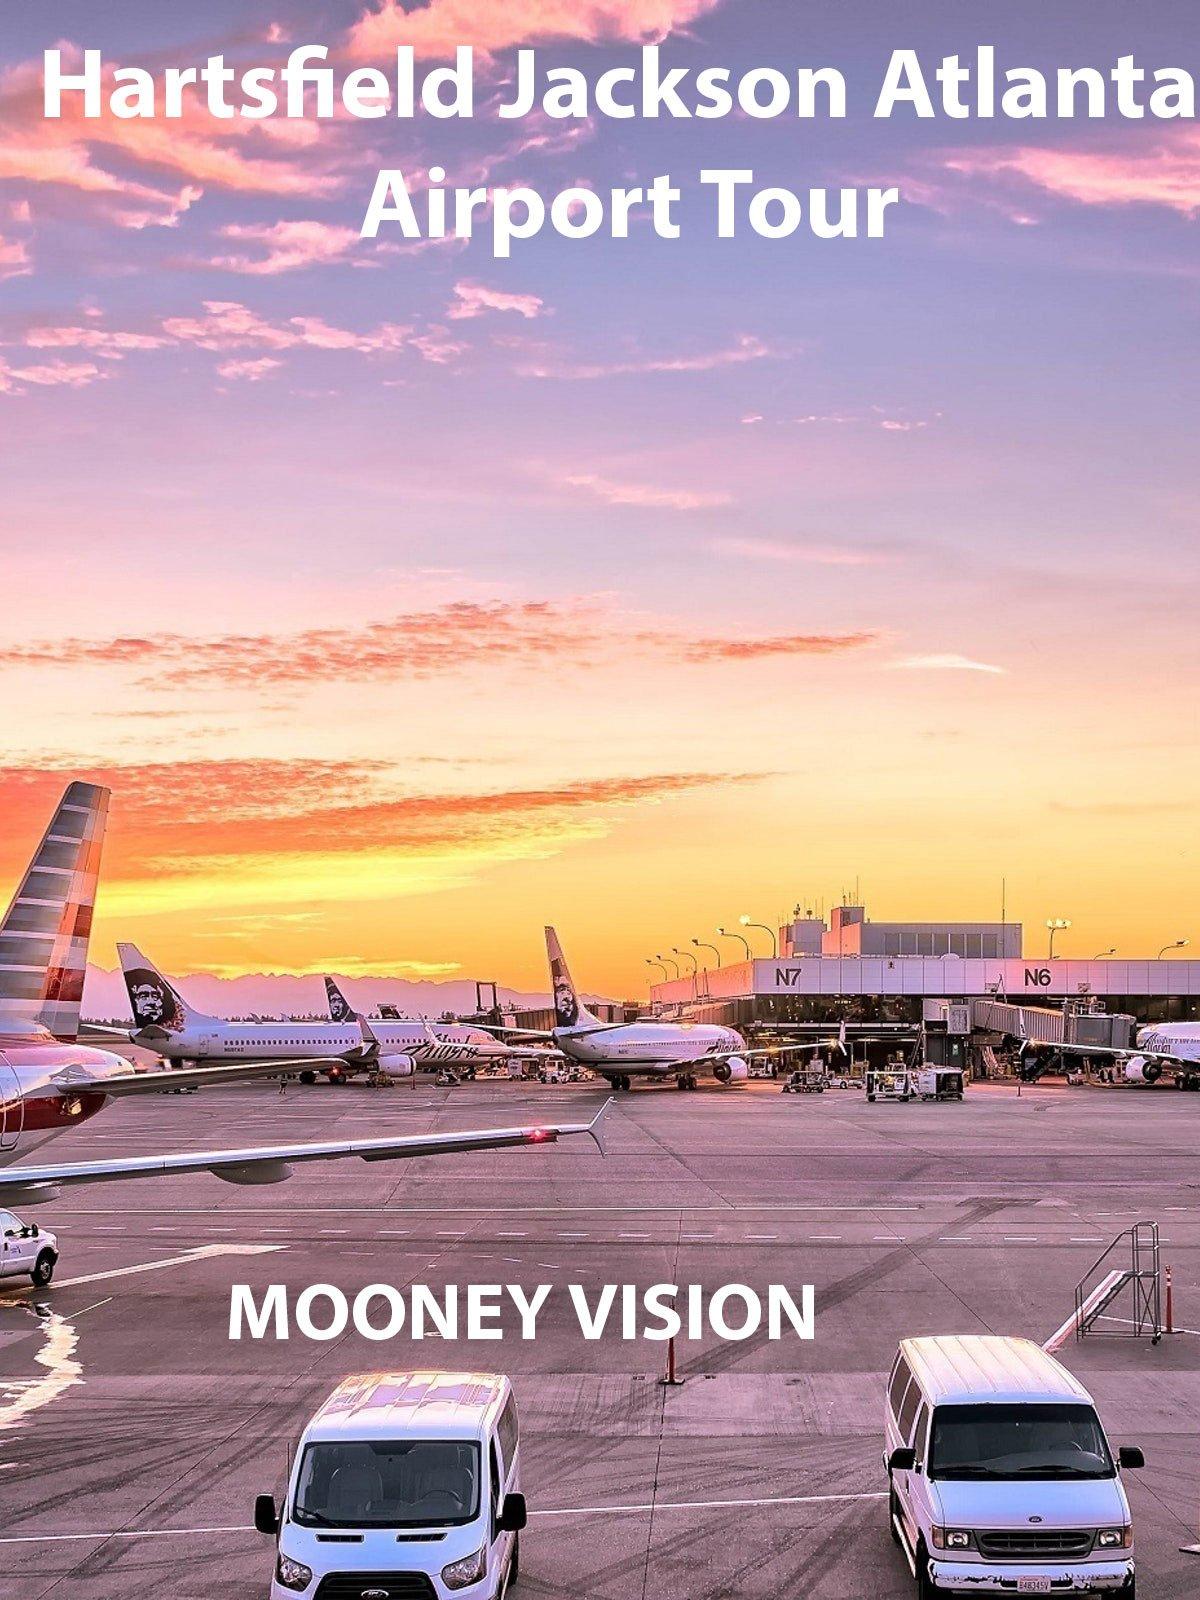 Hartsfield Jackson Atlanta Airport Tour